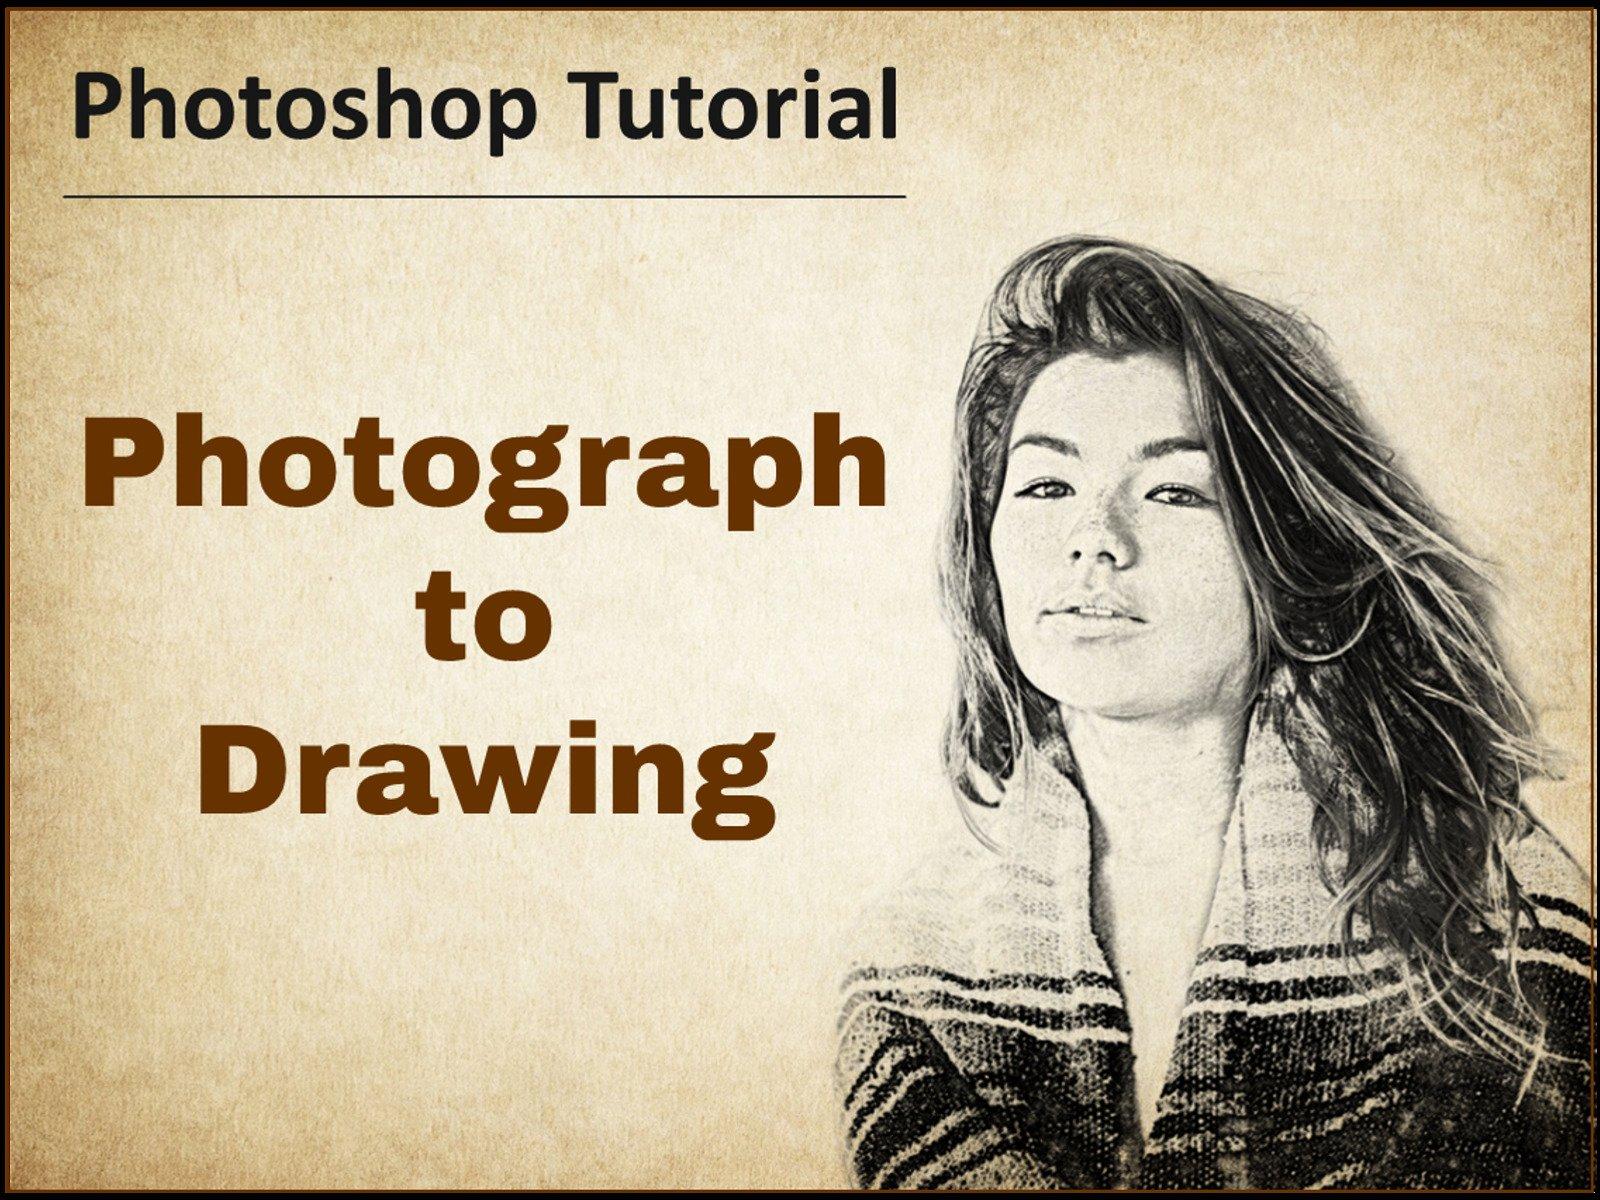 Amazon com: Photograph to Drawing - Photoshop Tutorial: Noel